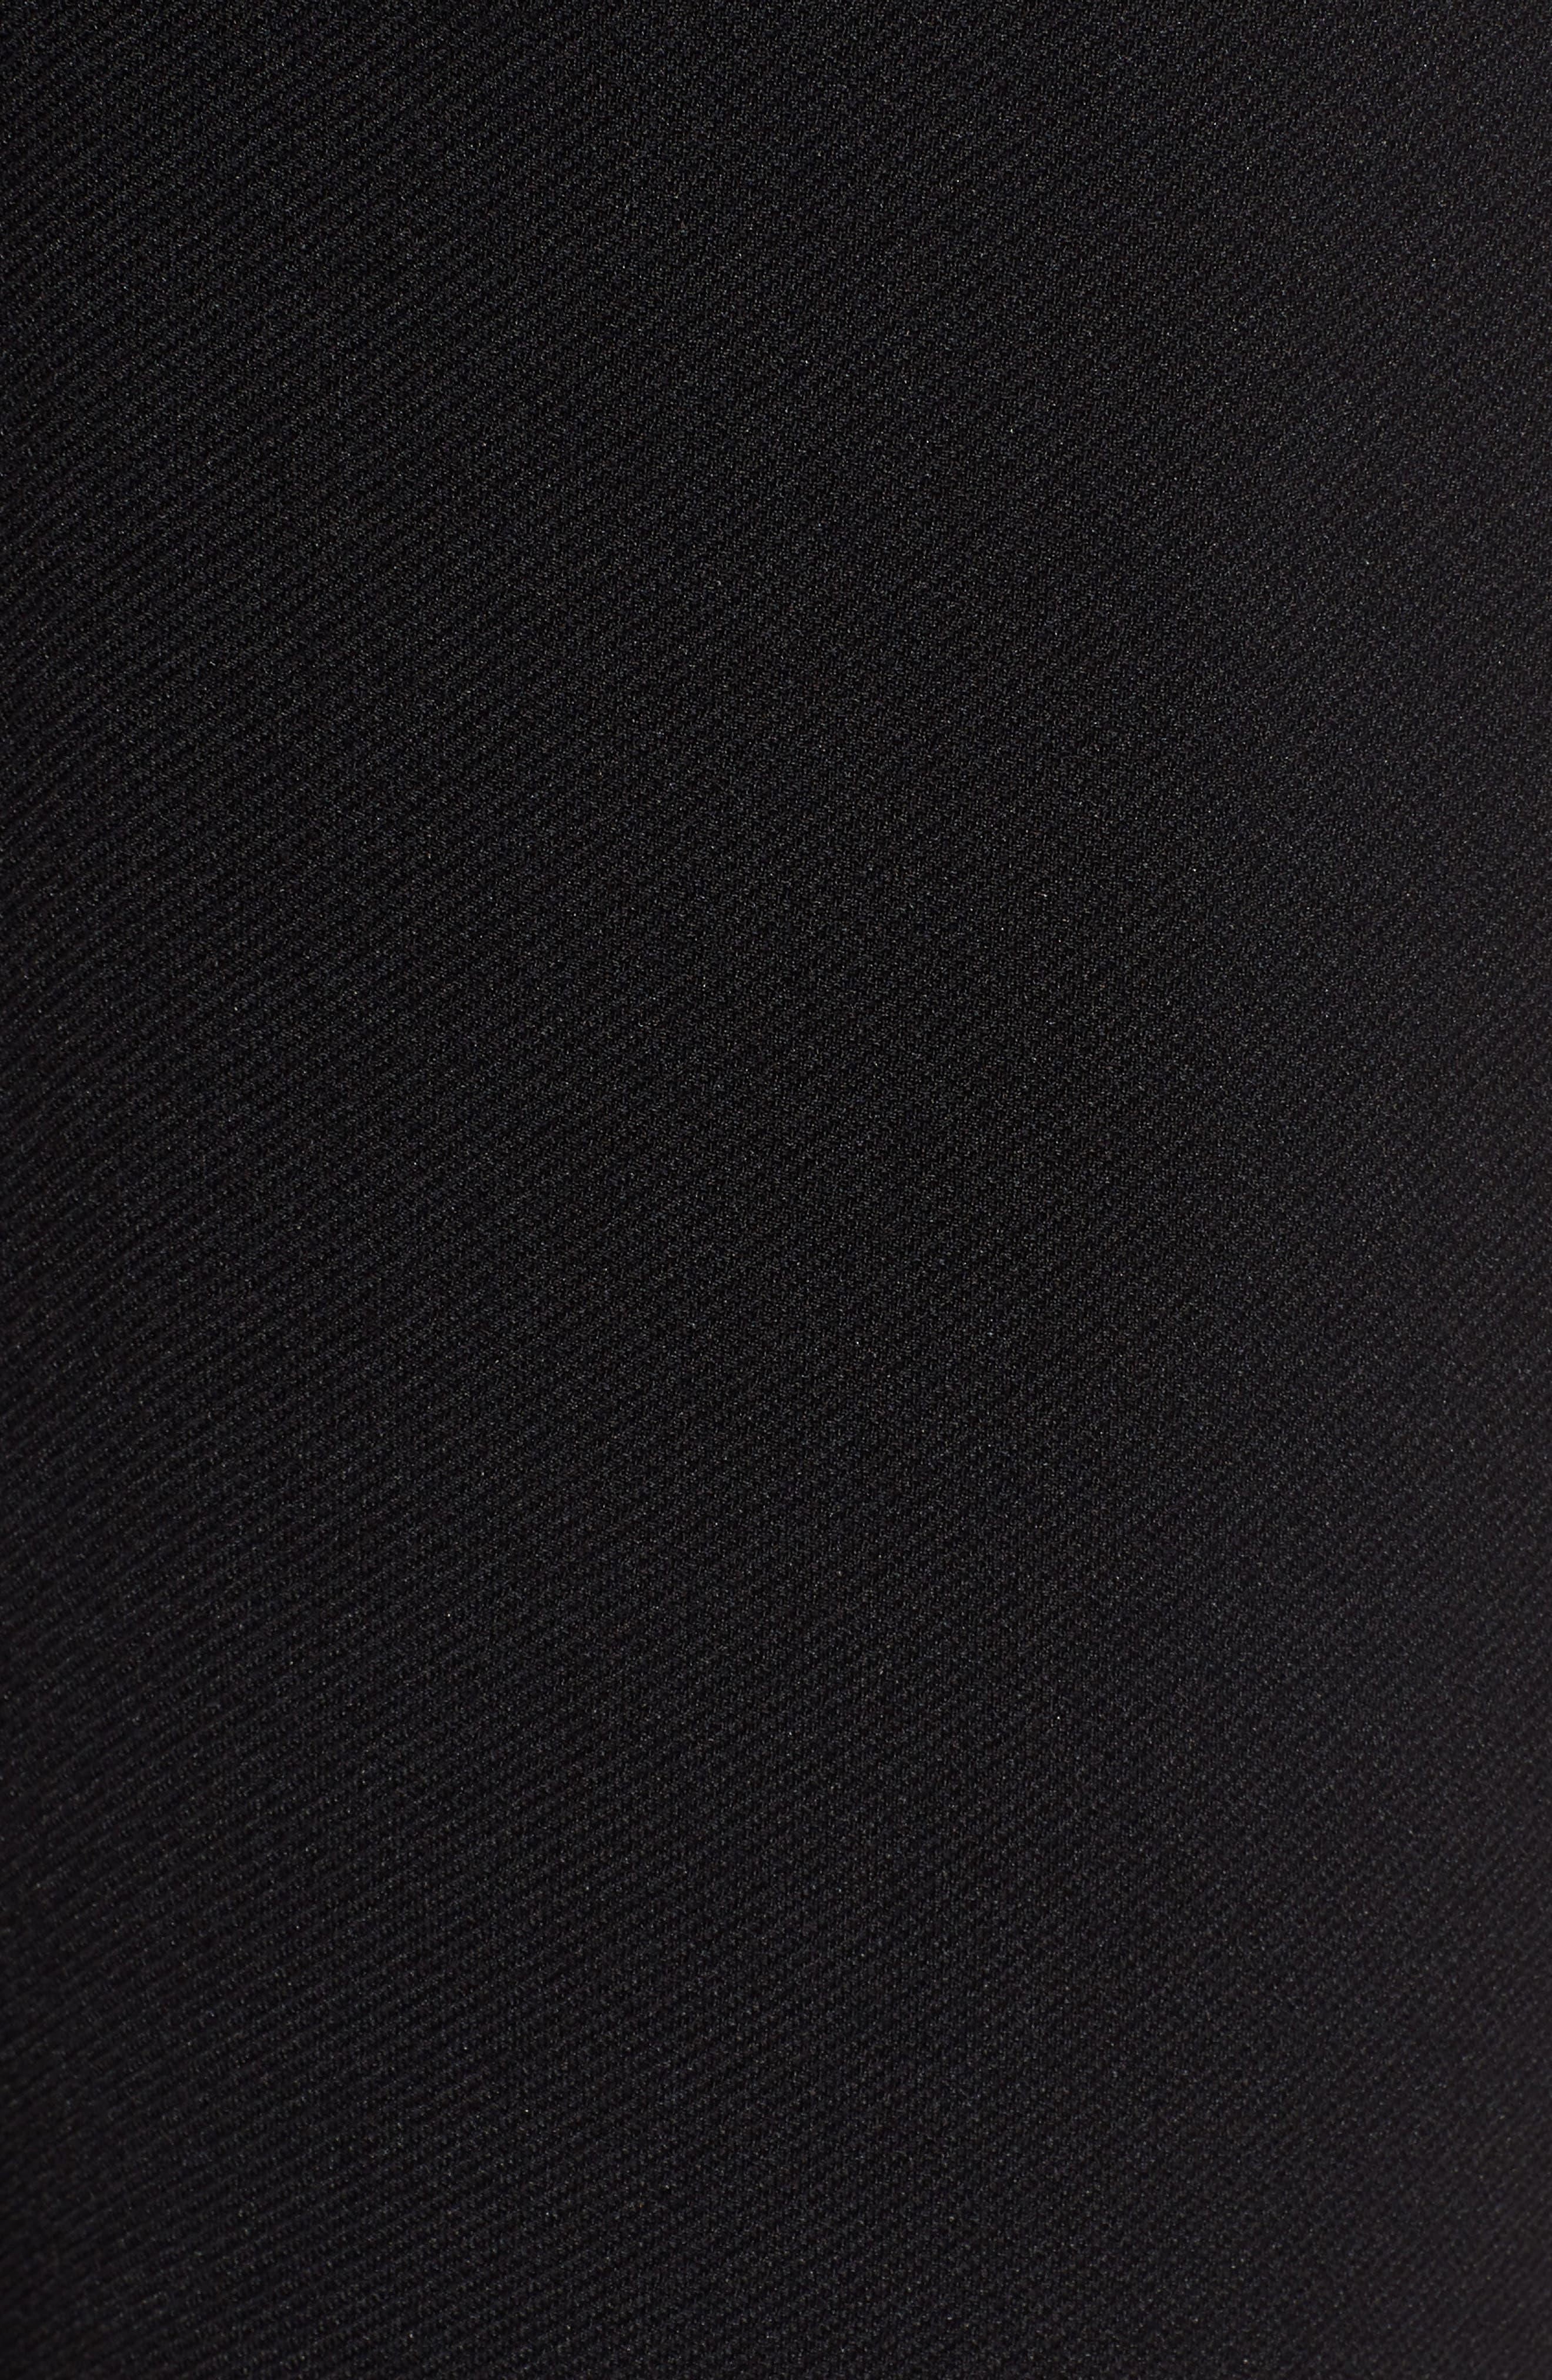 Tilezea Twill Jersey Trousers,                             Alternate thumbnail 6, color,                             Black